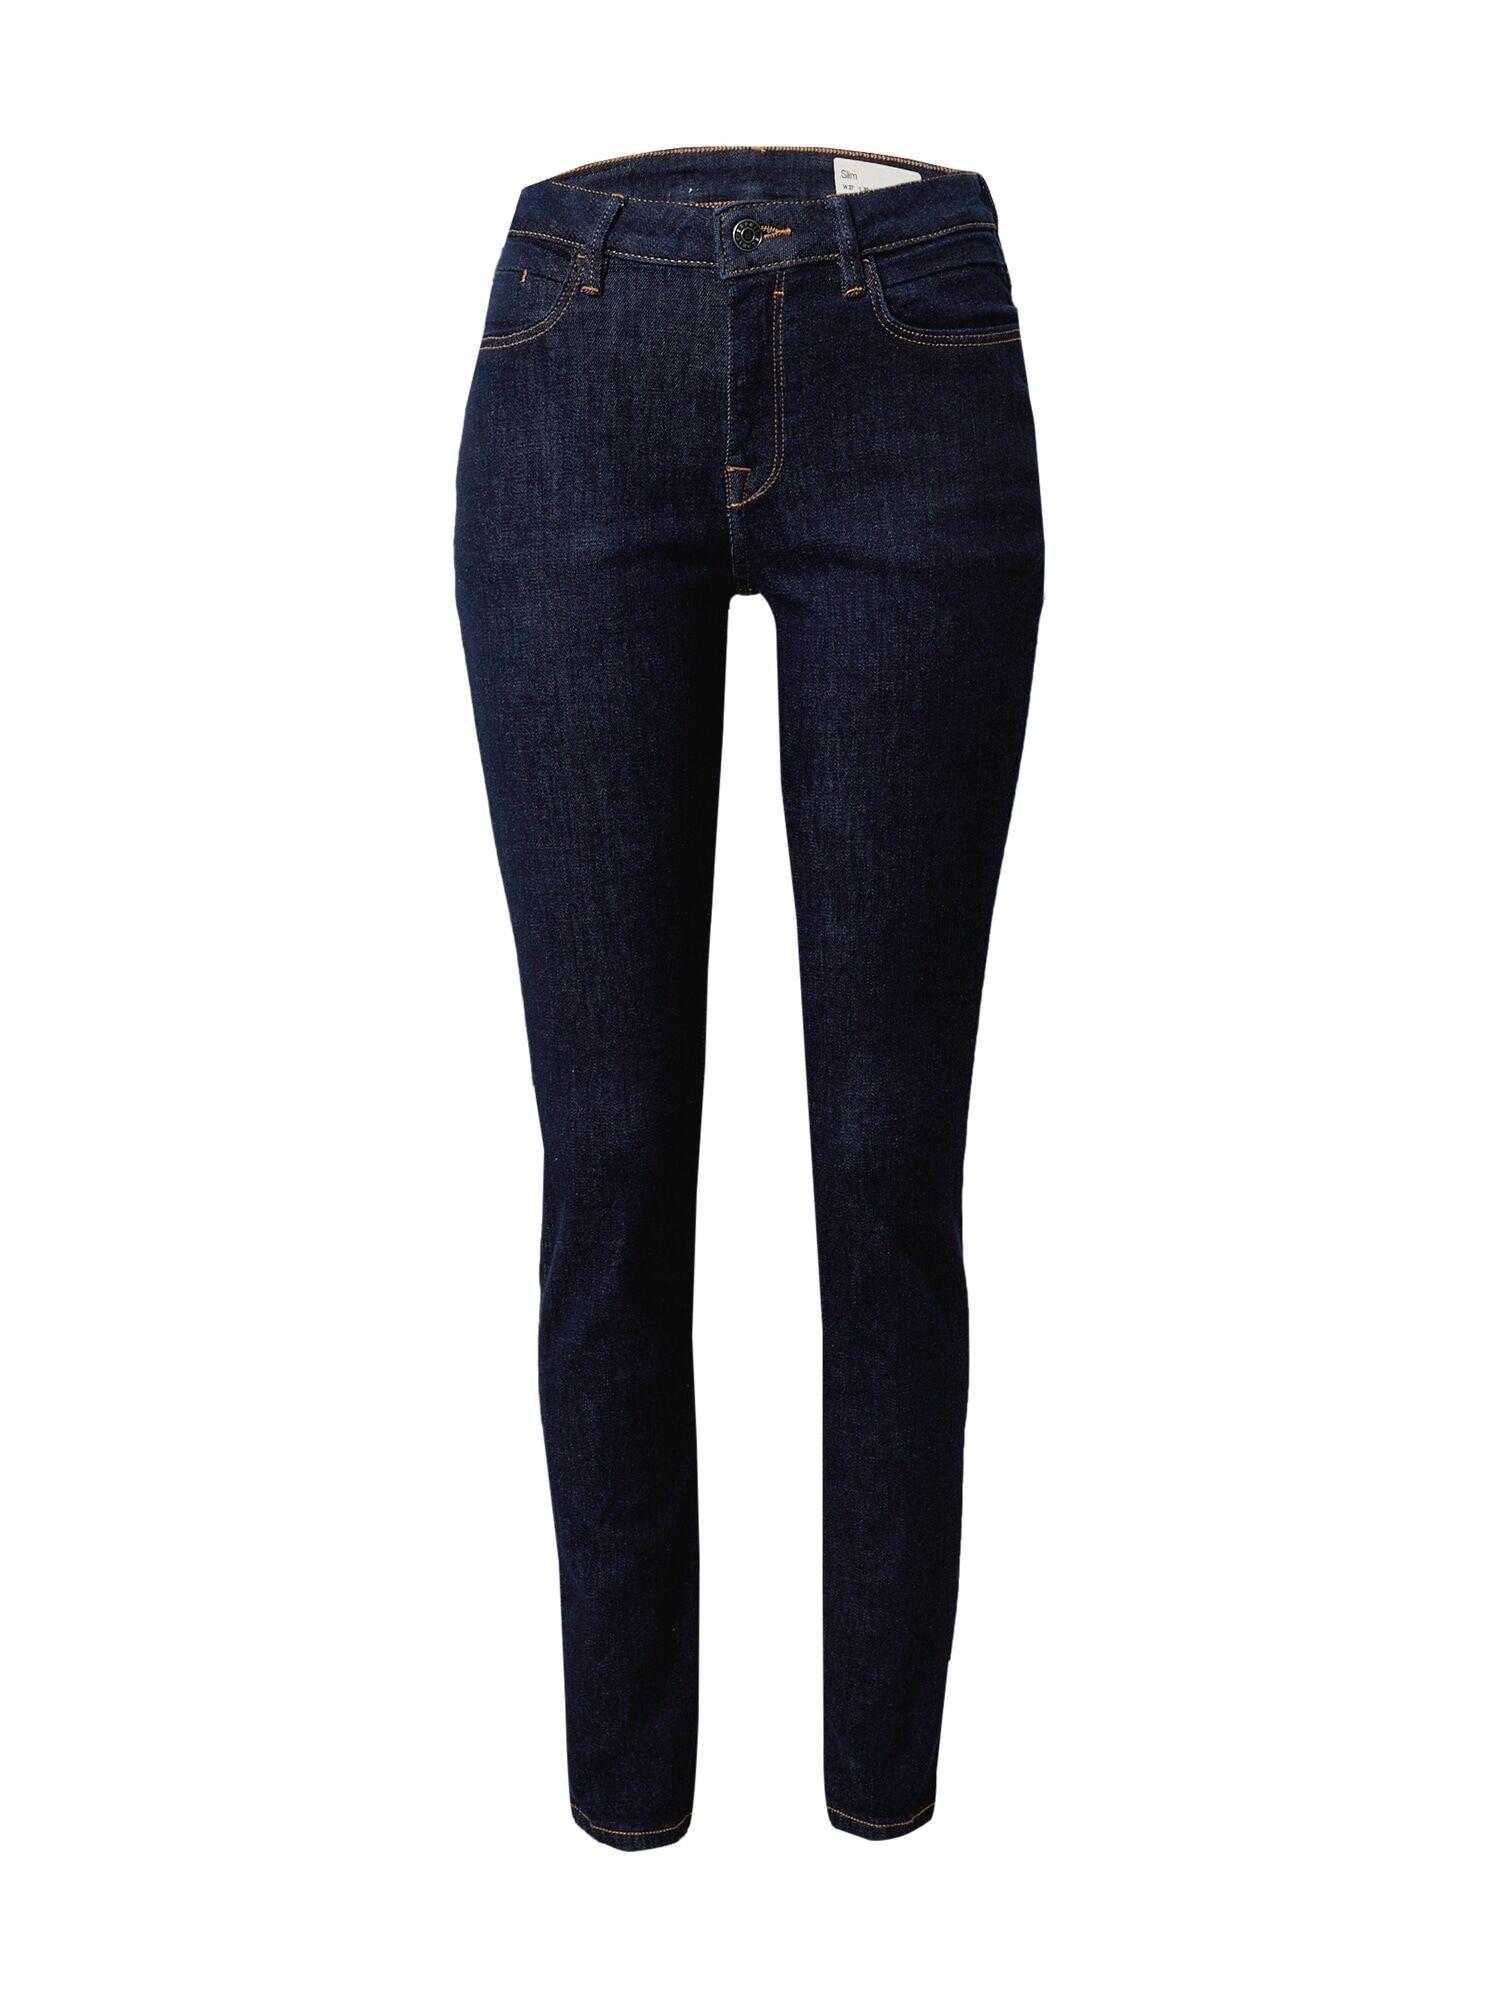 Esprit Jean  - Bleu - Taille: 26 - female